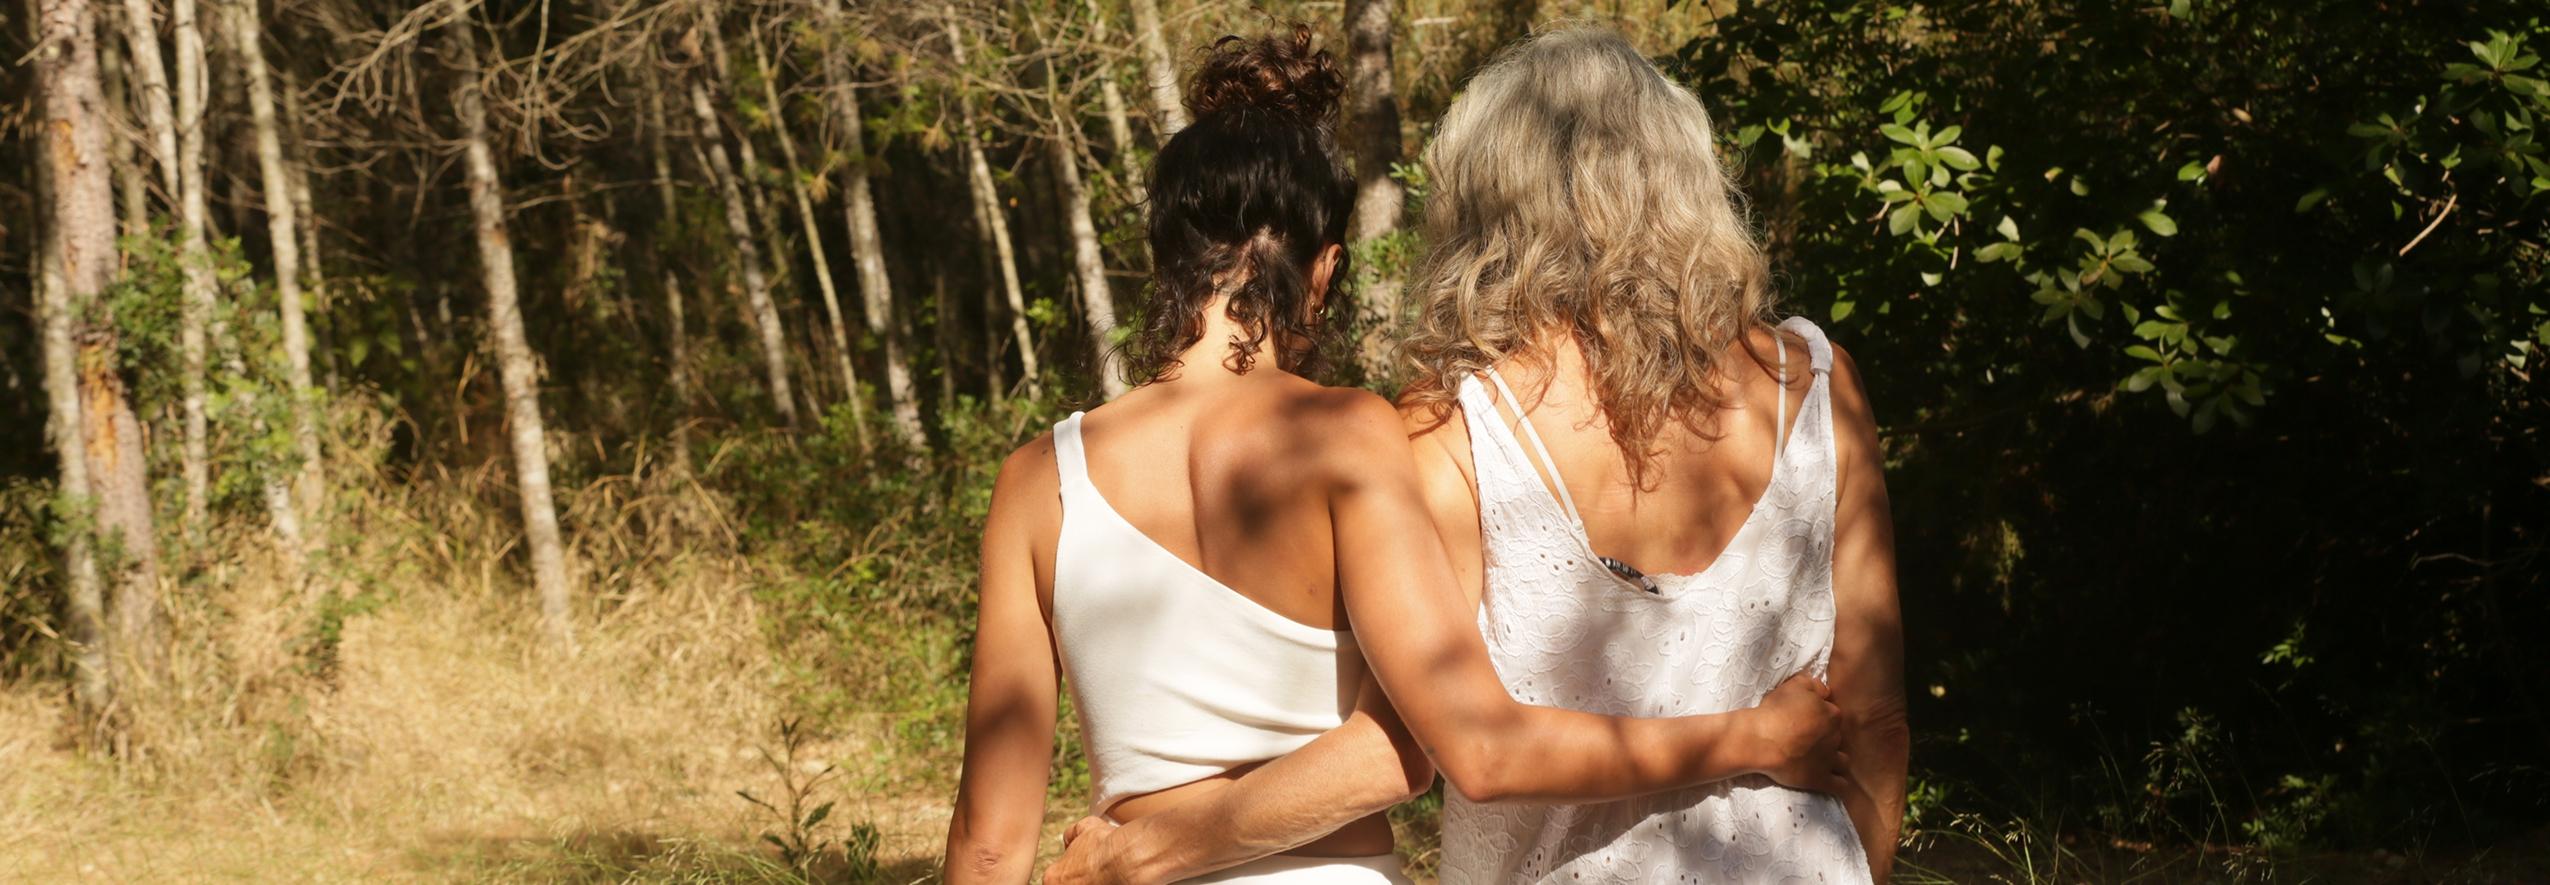 Supplement-Guide-Women-Hugging